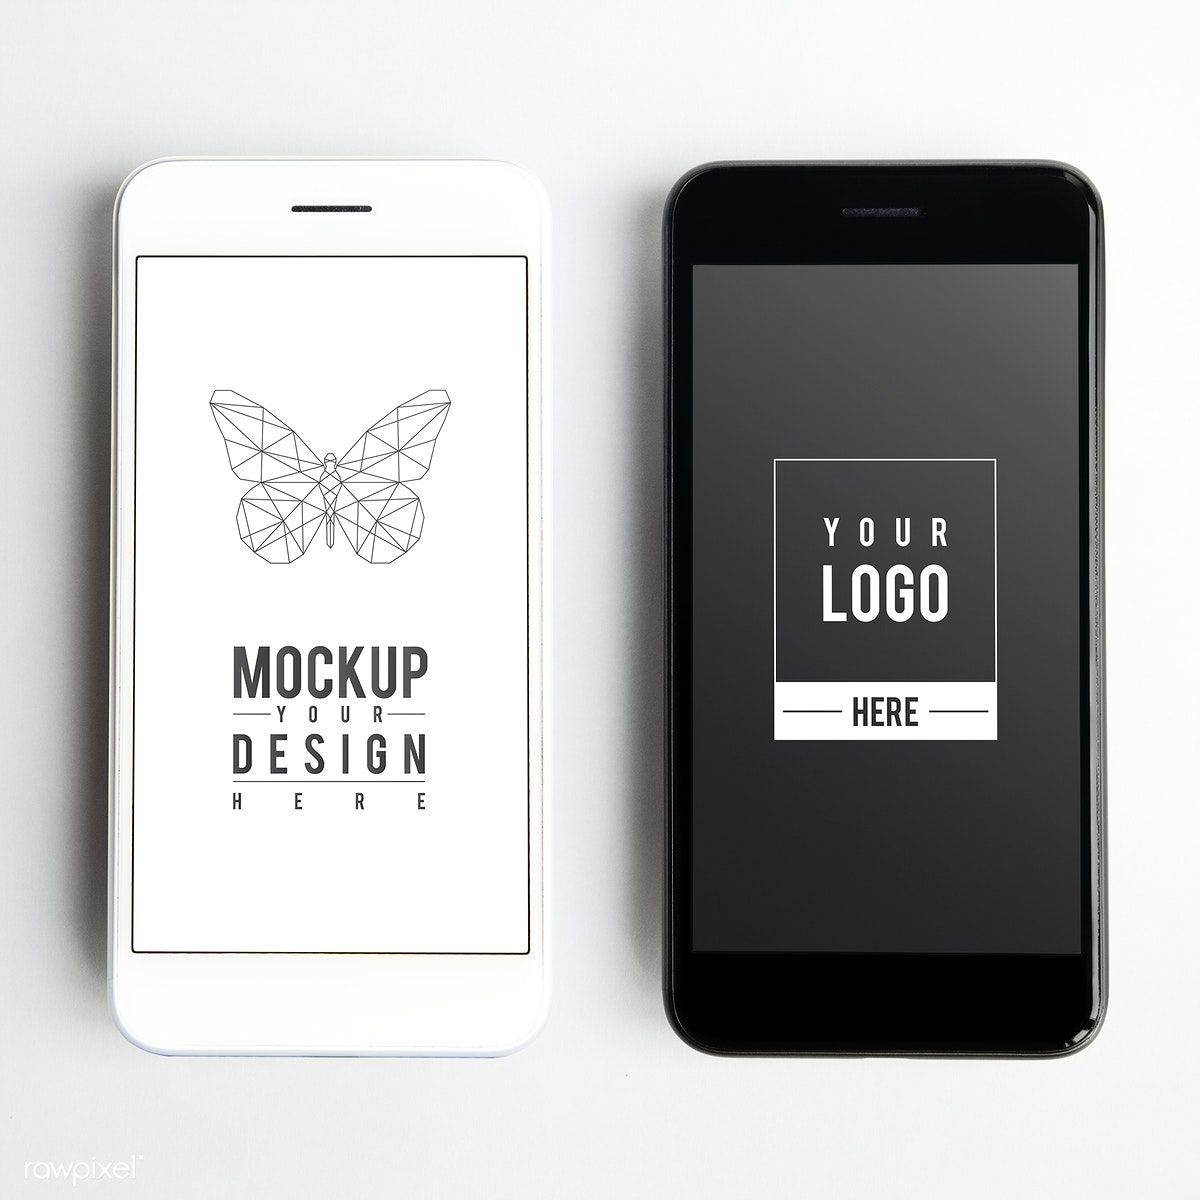 Premium Mobile Phone Screen Mockup Template Free Image By Rawpixel Com Ake Mockup Template Mockup Template Free Phone